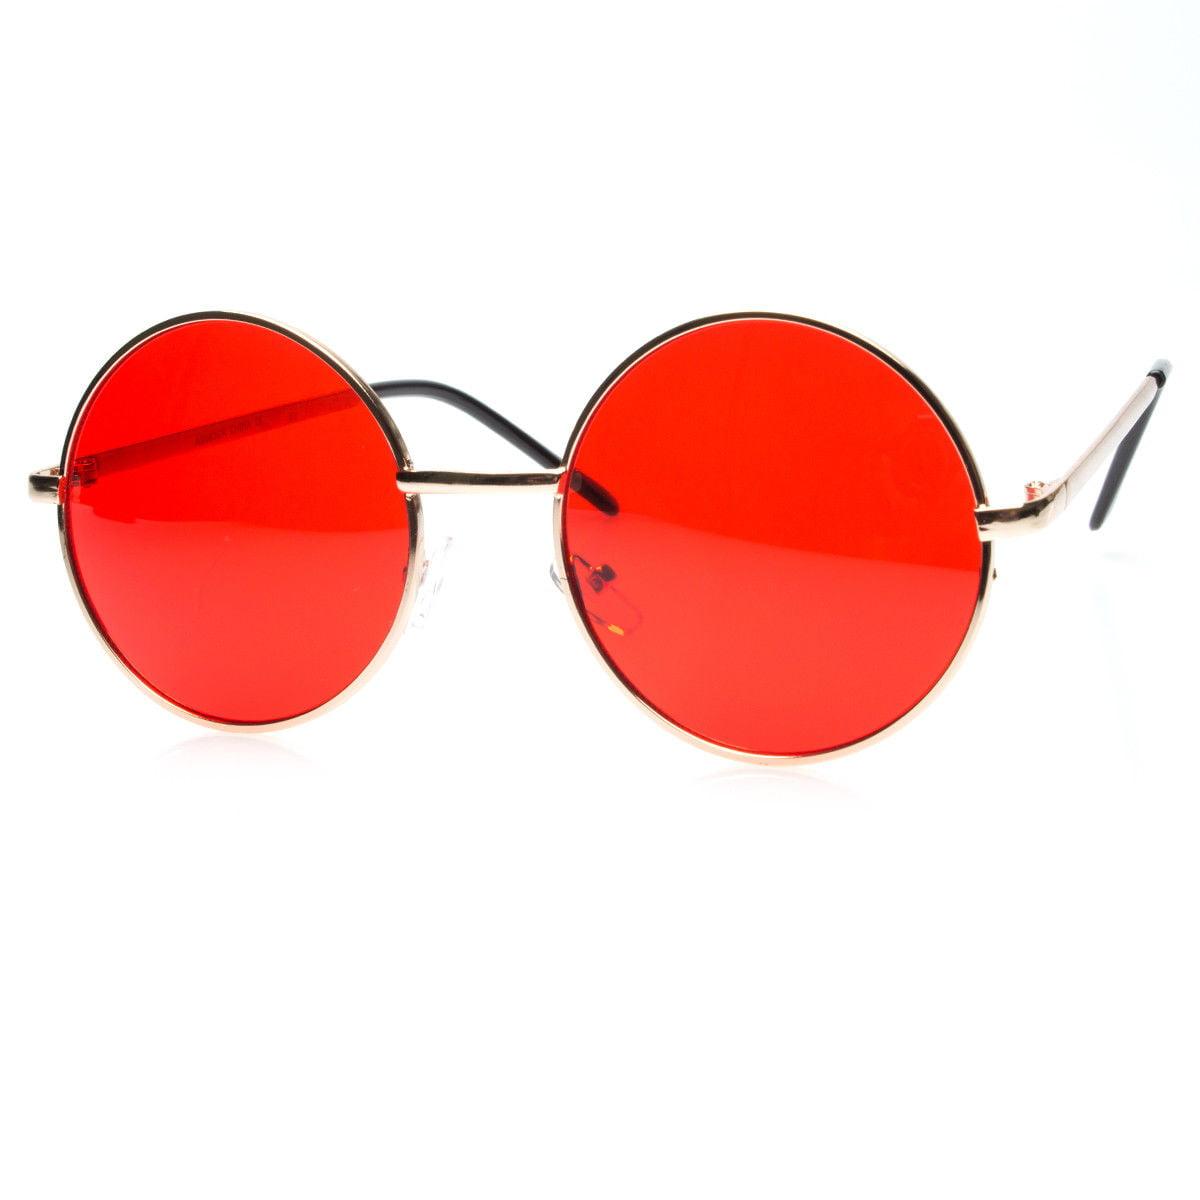 John Lennon Large Sunglasses Round Shades Silver Gold Frame Color Lens Retro New